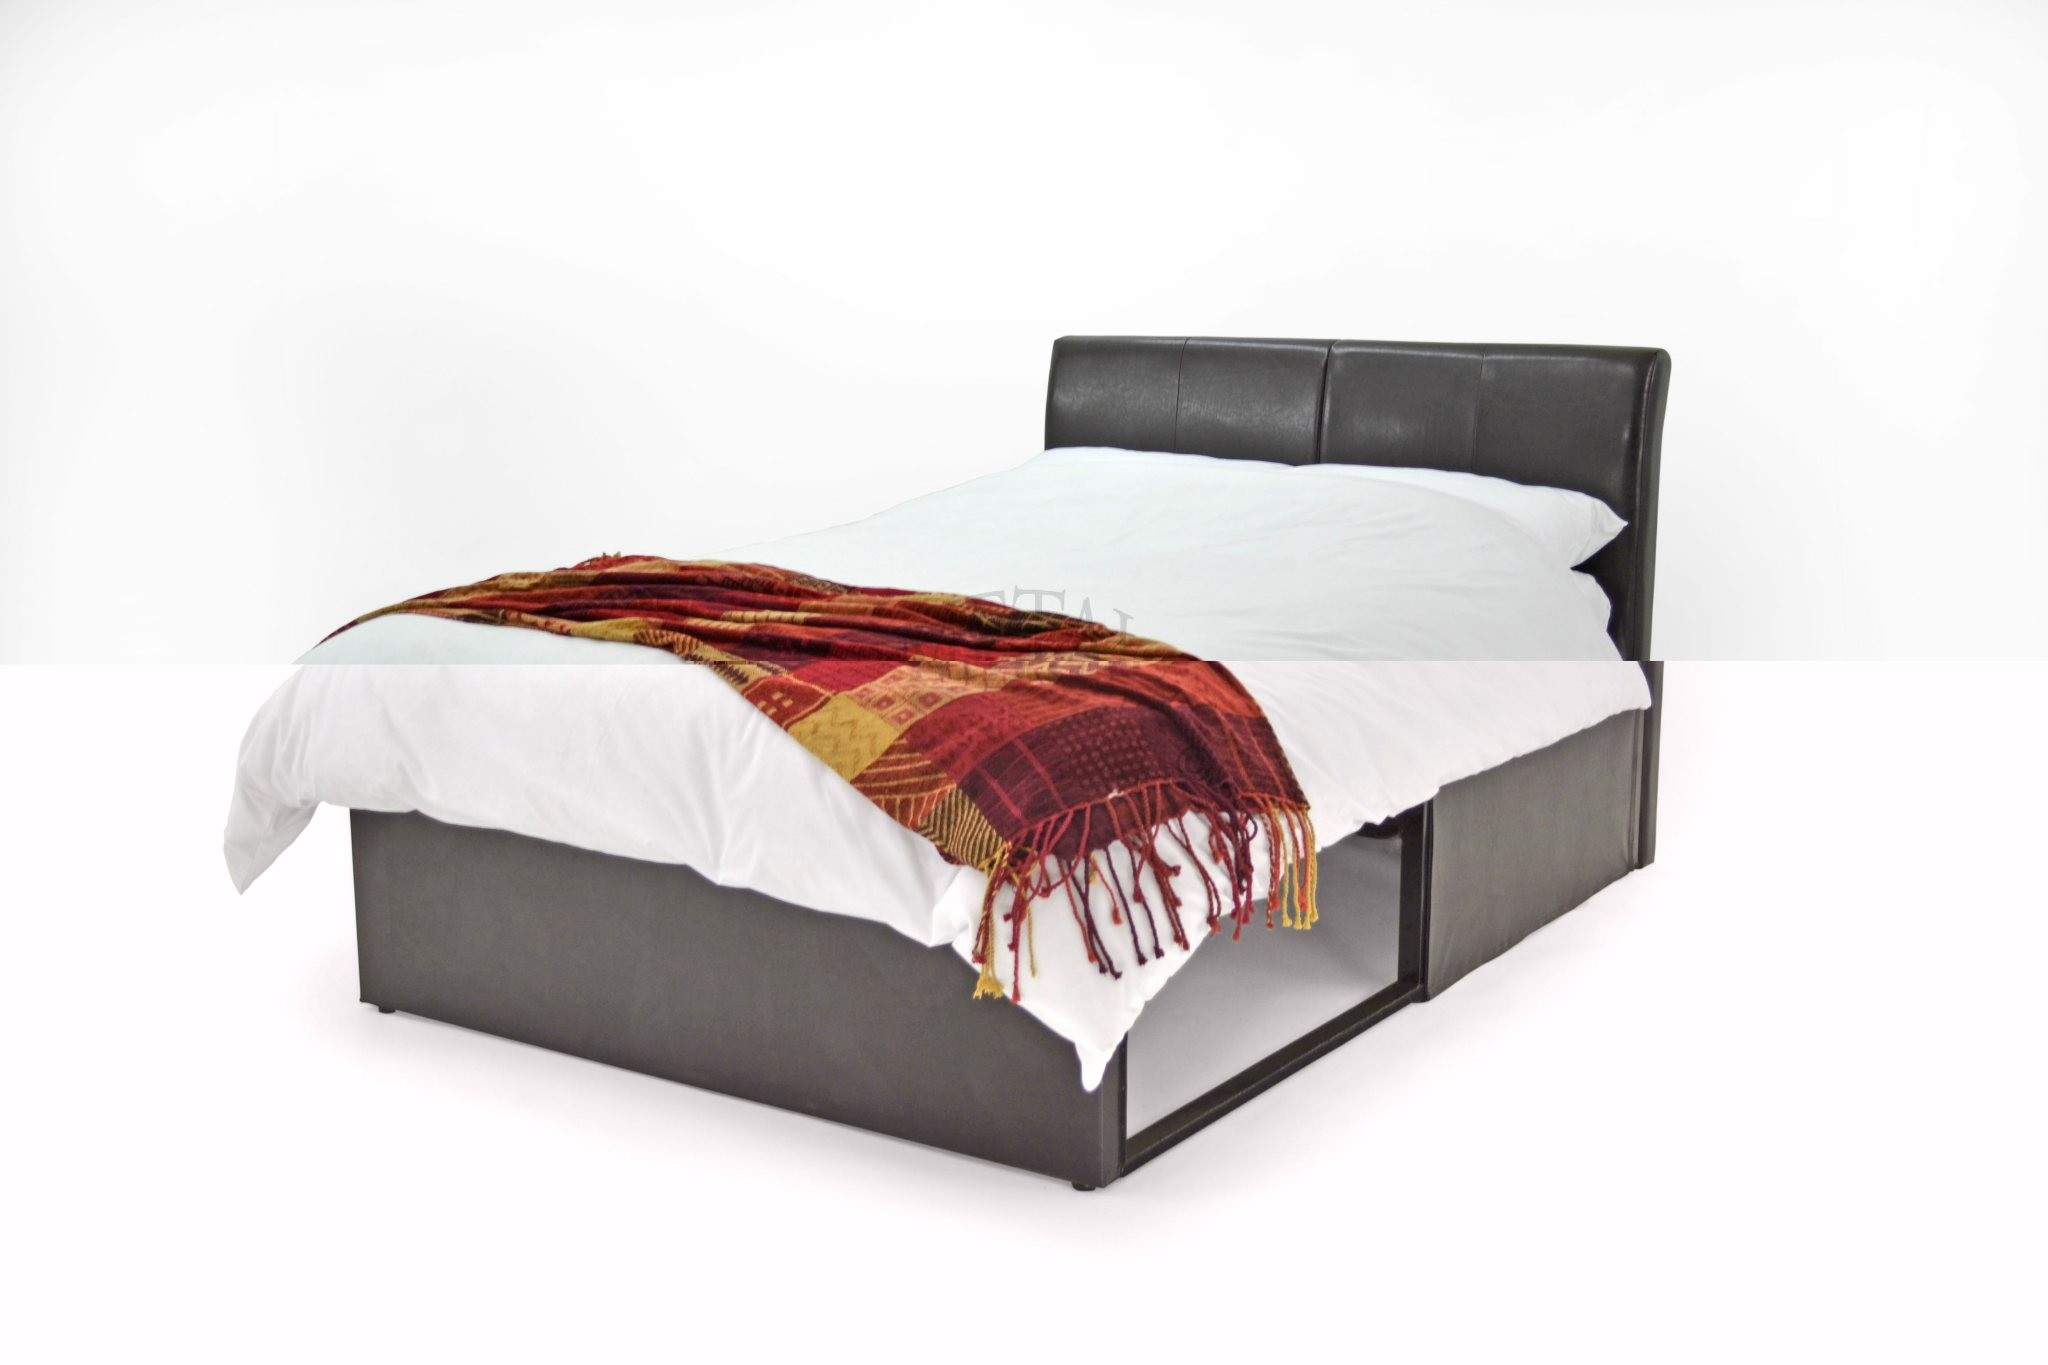 Metal Beds Texas Drawer Divan Bed Frame